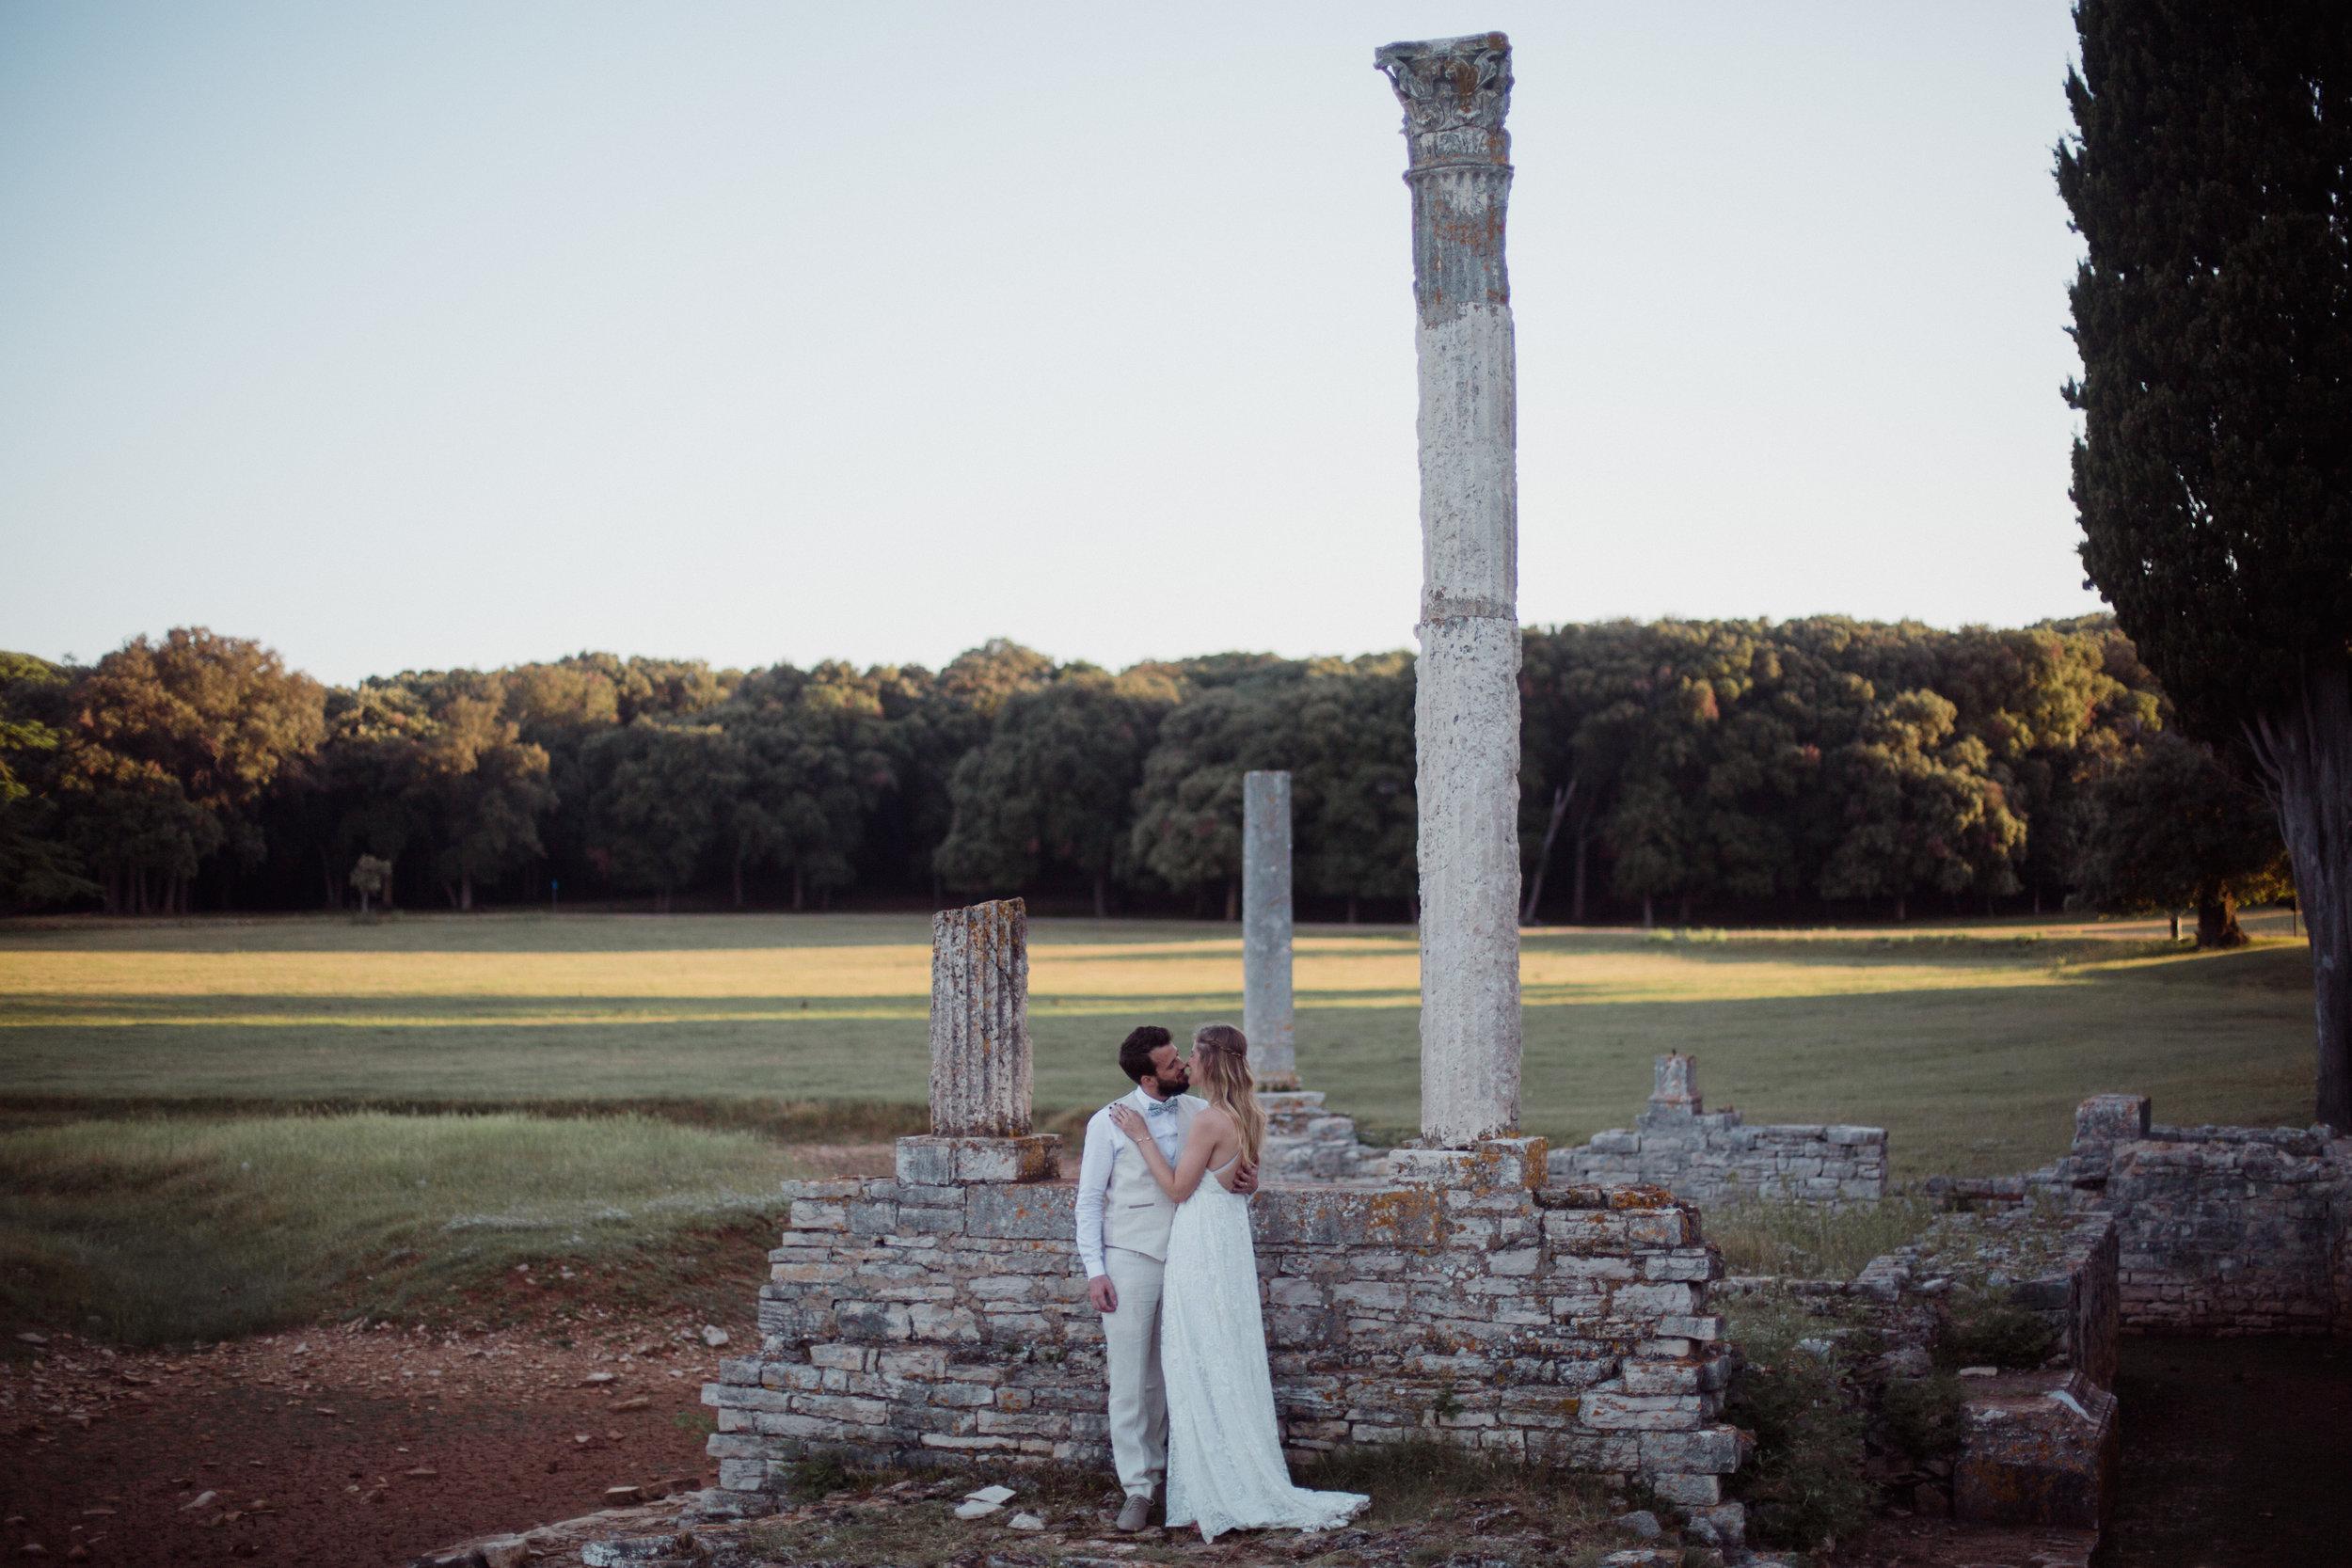 mariage-croatie-ile-brijuni-photographe-france-pauline-maroussia